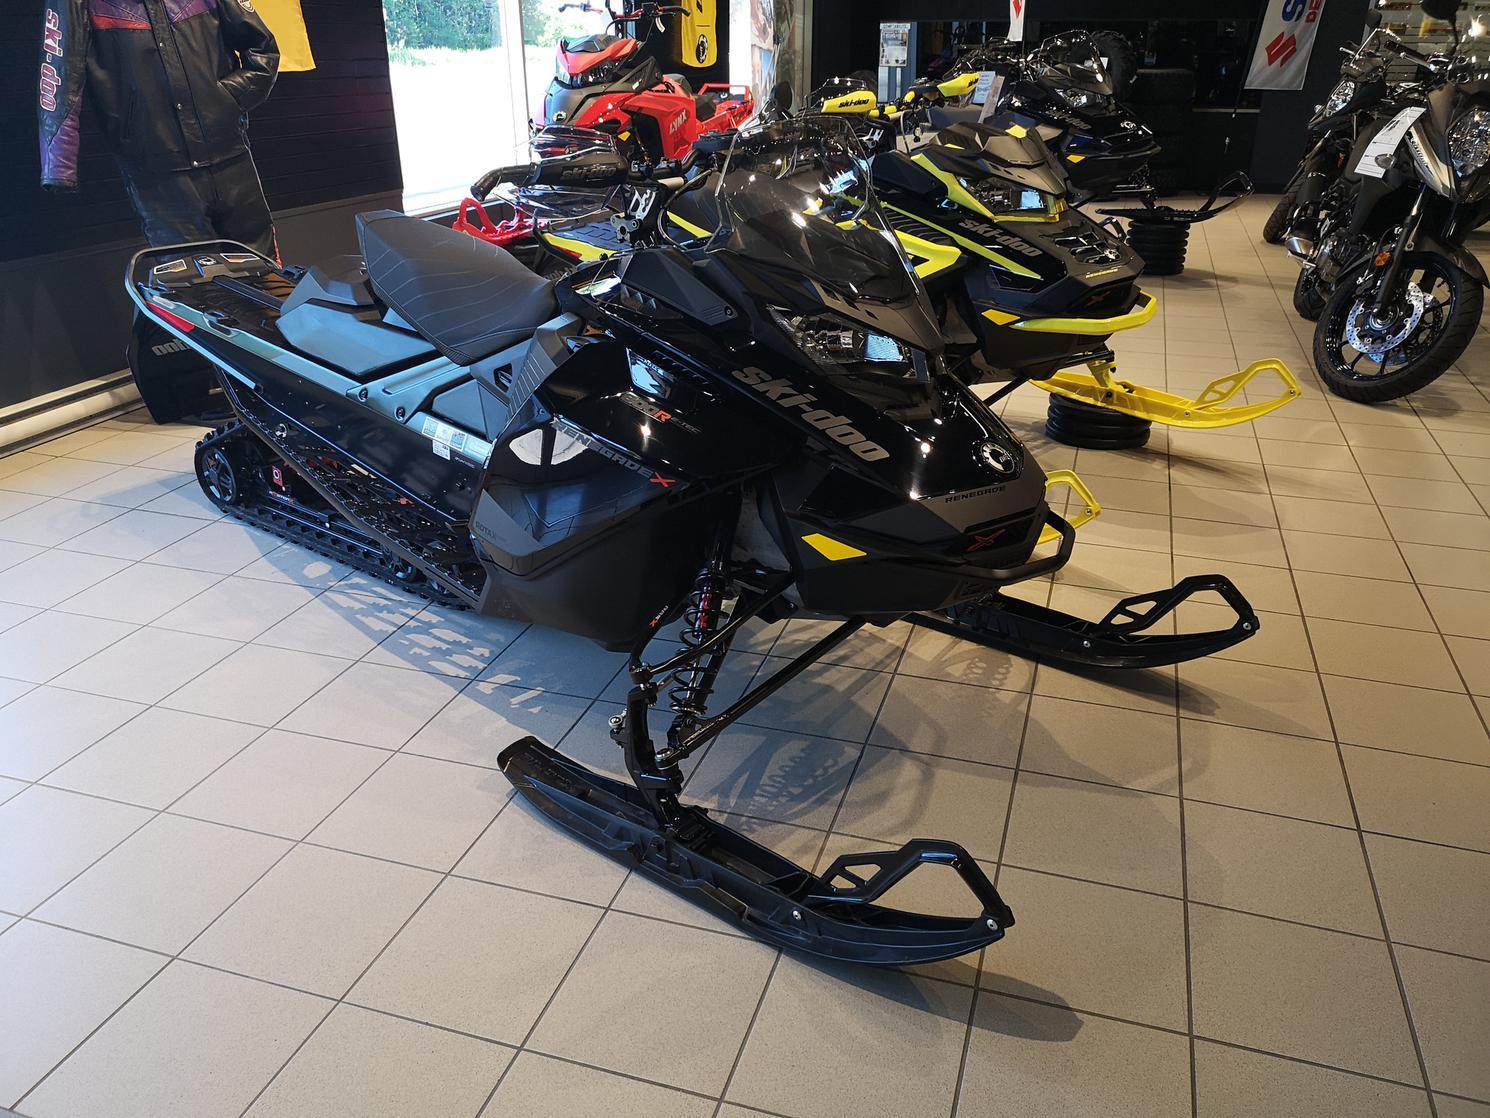 Ski-Doo Renegade X 600 R 2021